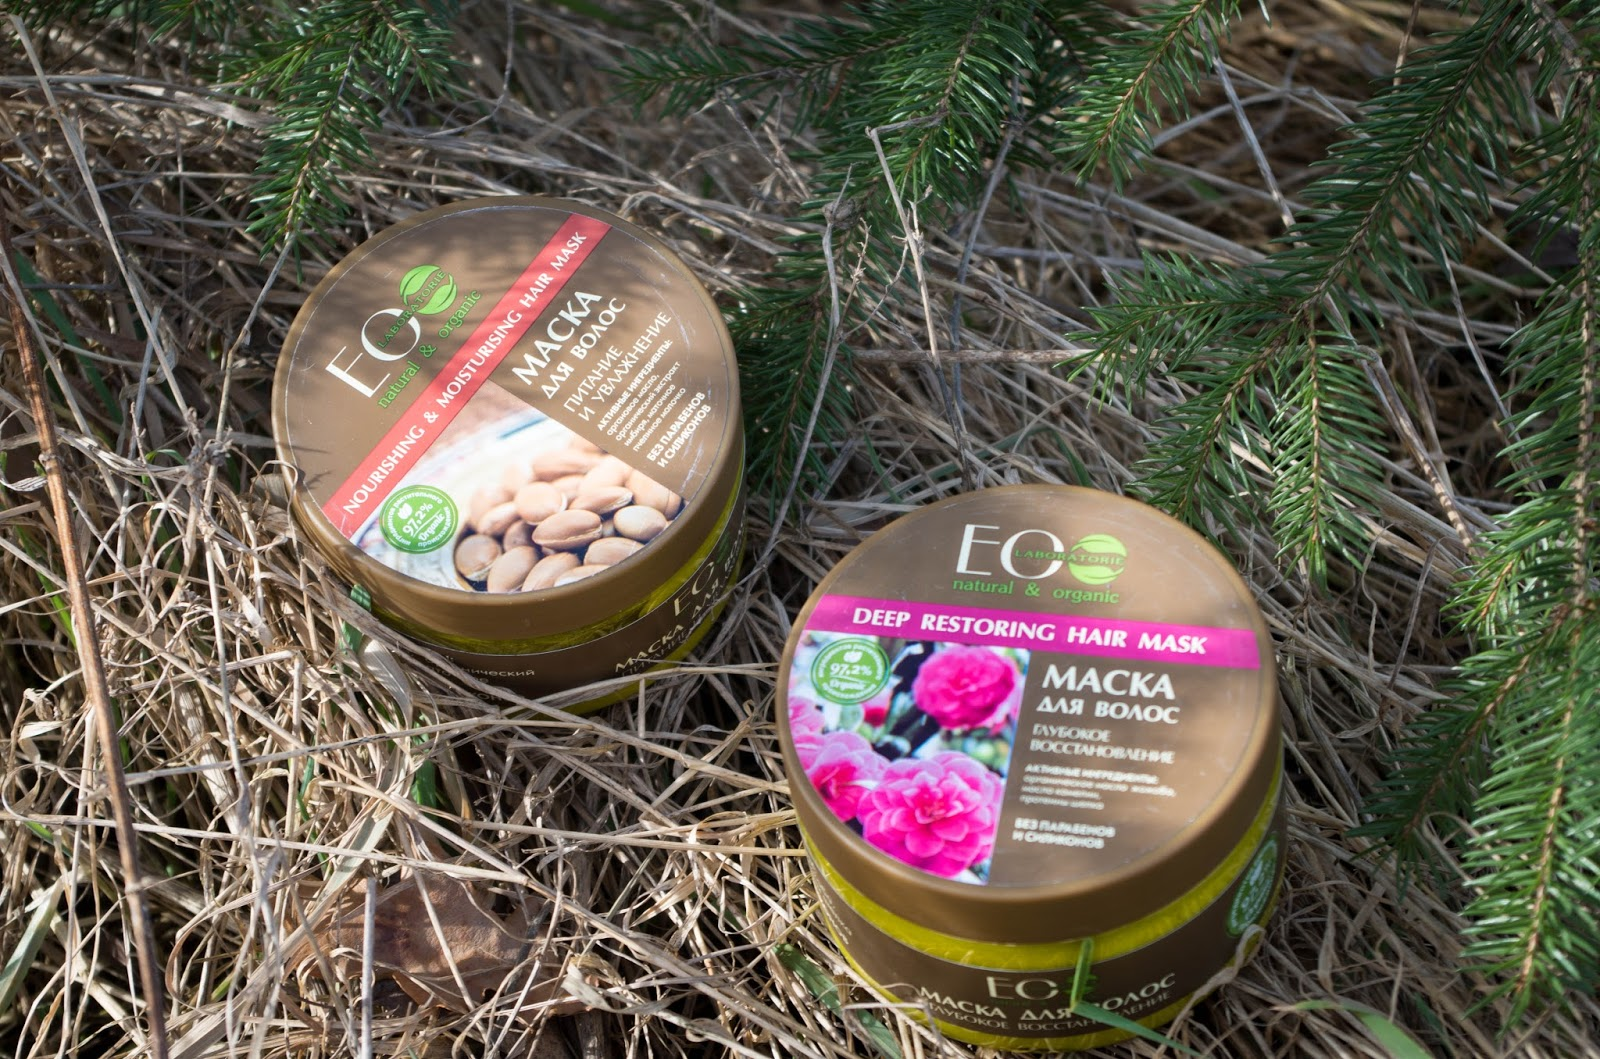 Recenzja - maski i balsam Ecolab